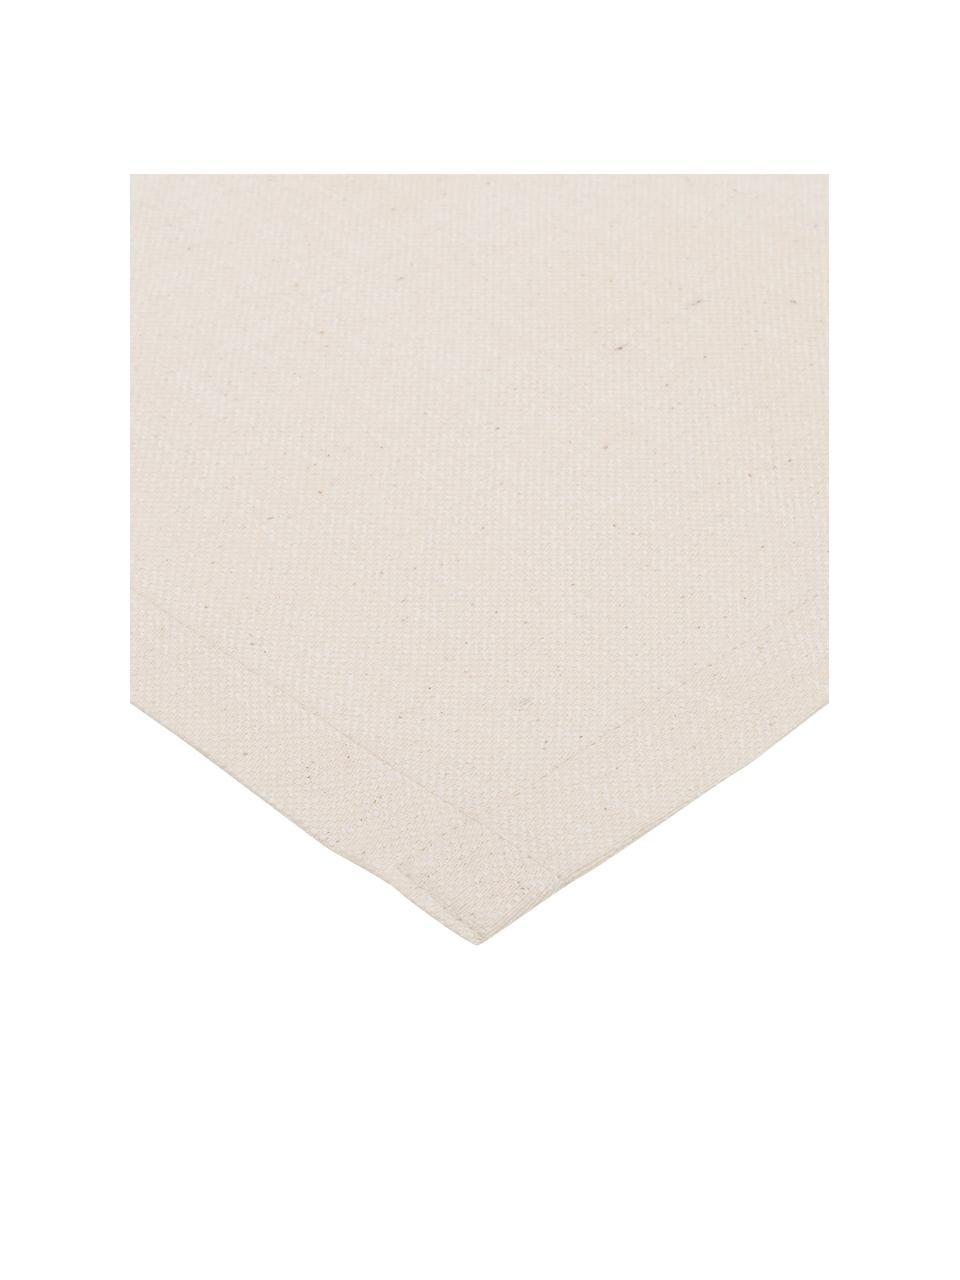 Runner in misto cotone beige Riva, 55% cotone, 45% poliestere, Beige, Larg. 40 x Lung. 150 cm